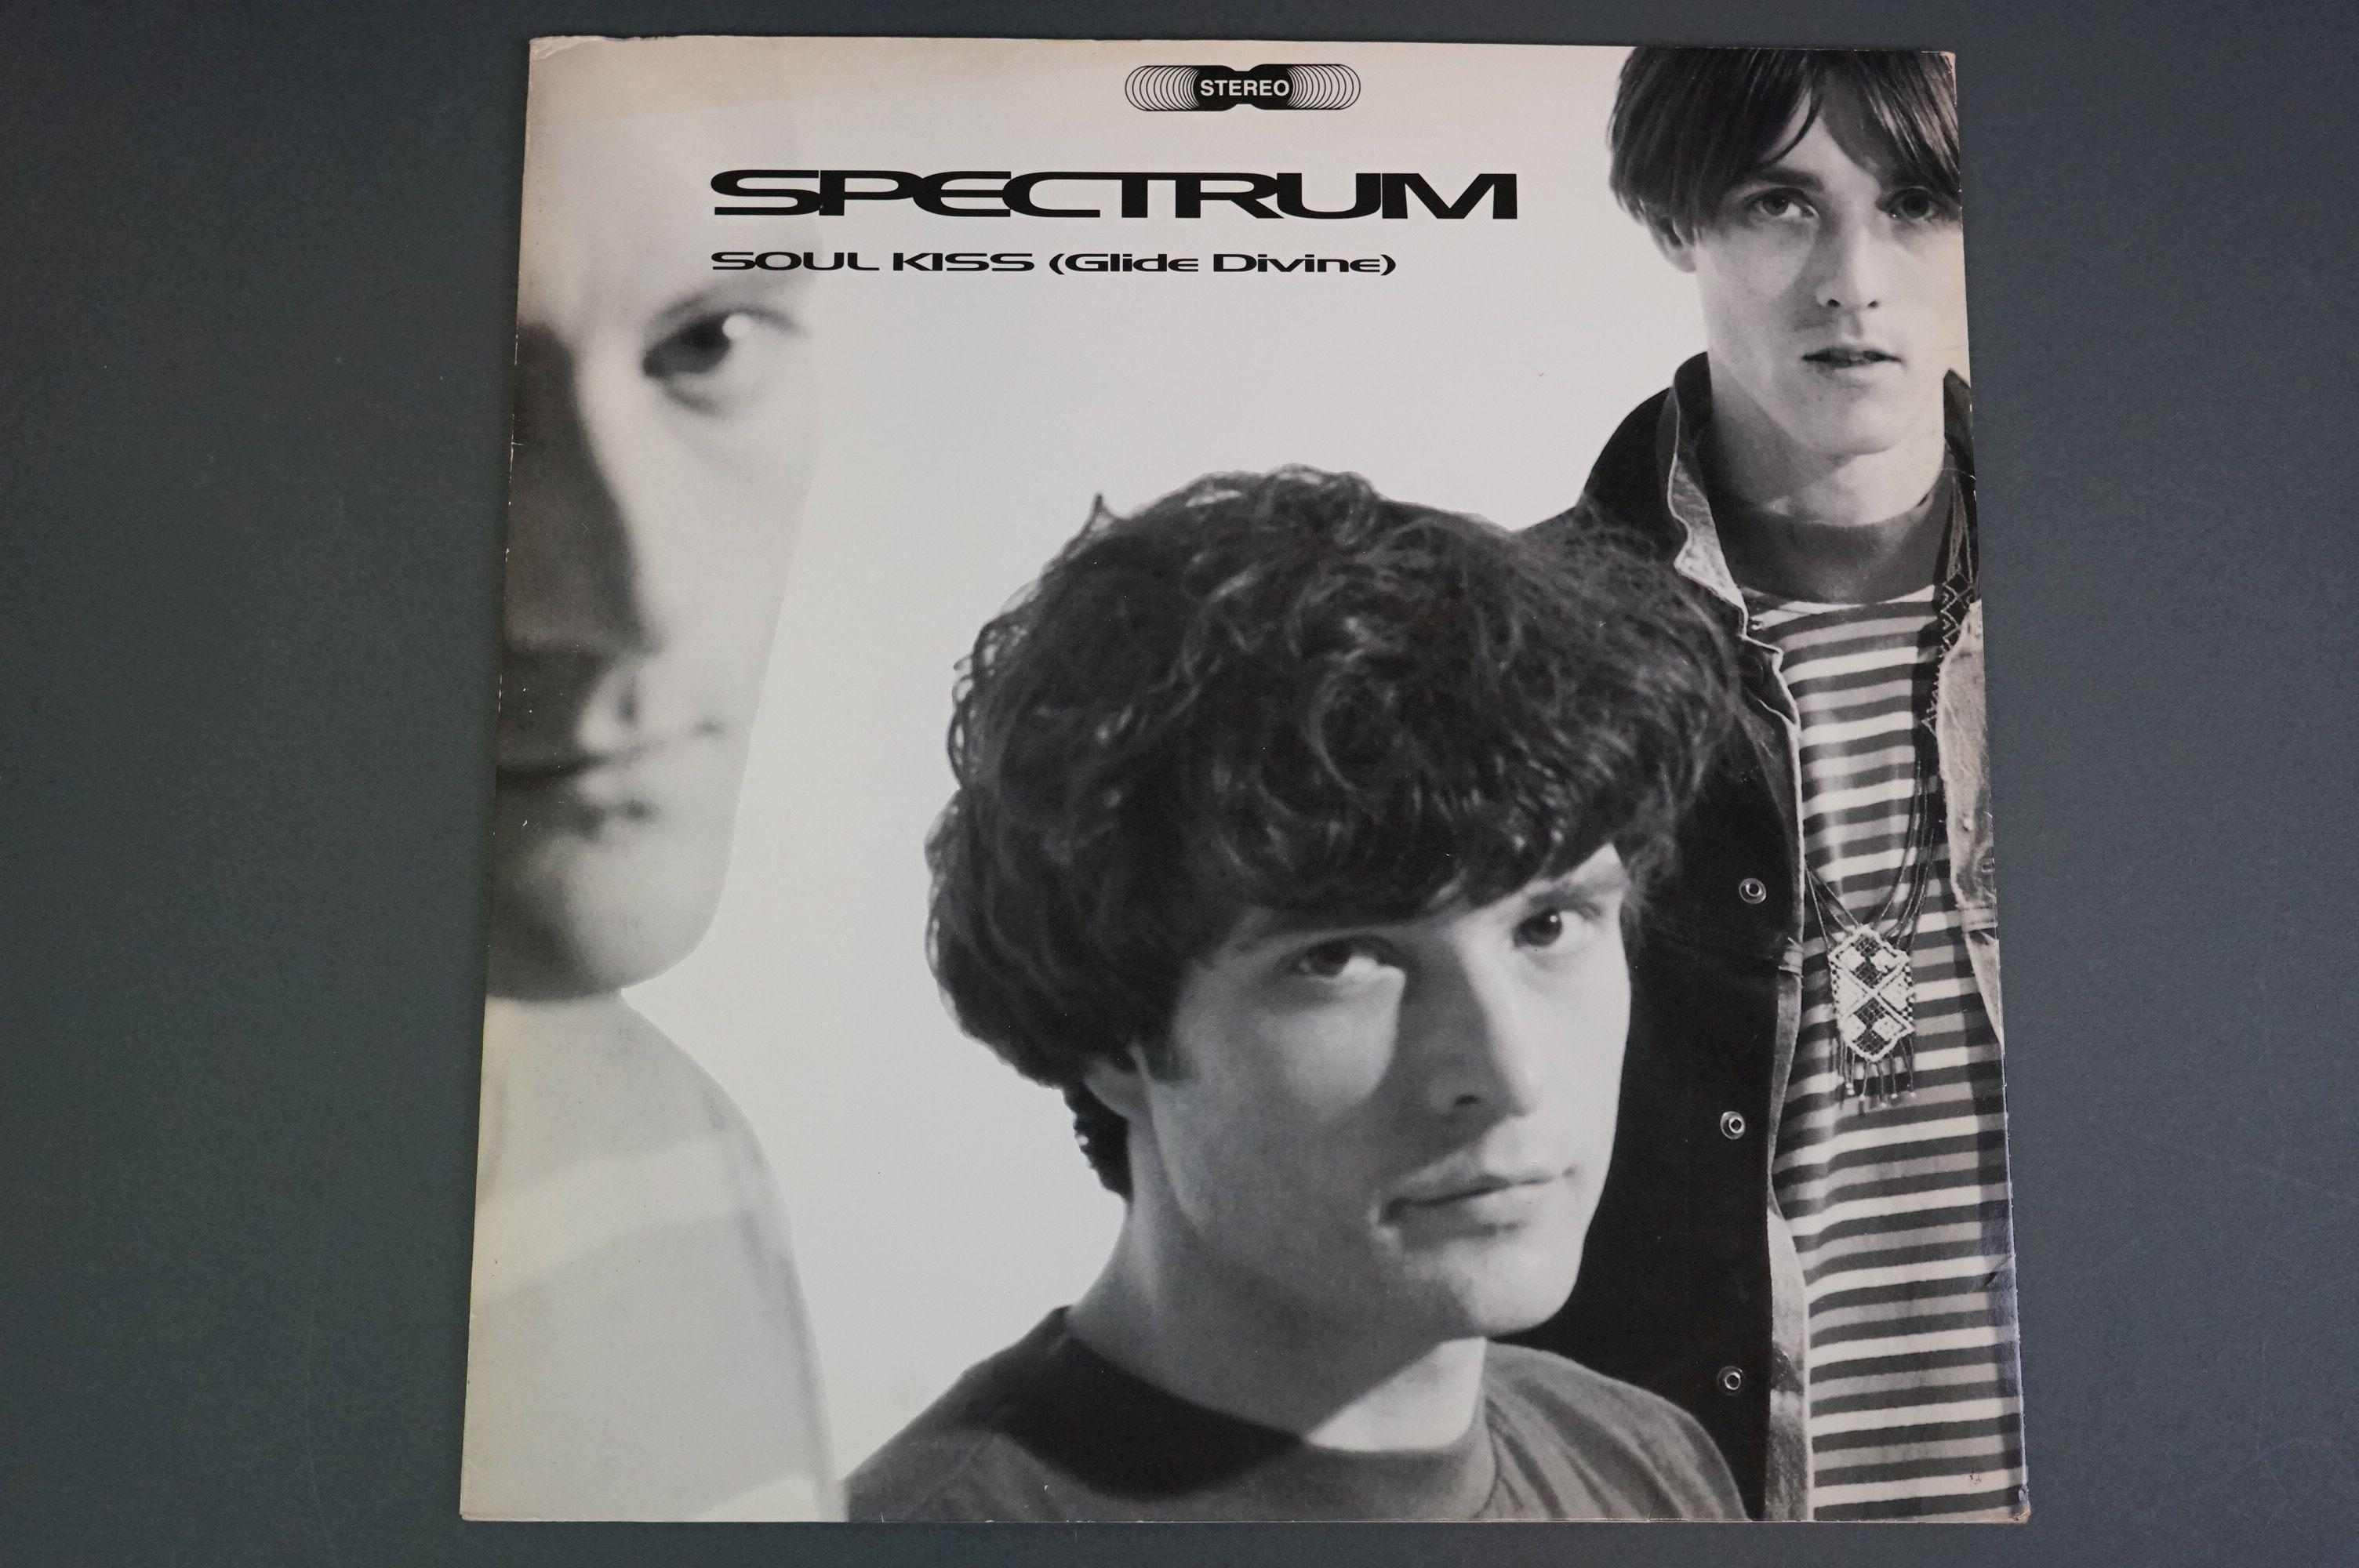 Vinyl - Spectrum Soul Kiss (Glide Devine) ORE LP 518 on Silvertone Records, original inner with